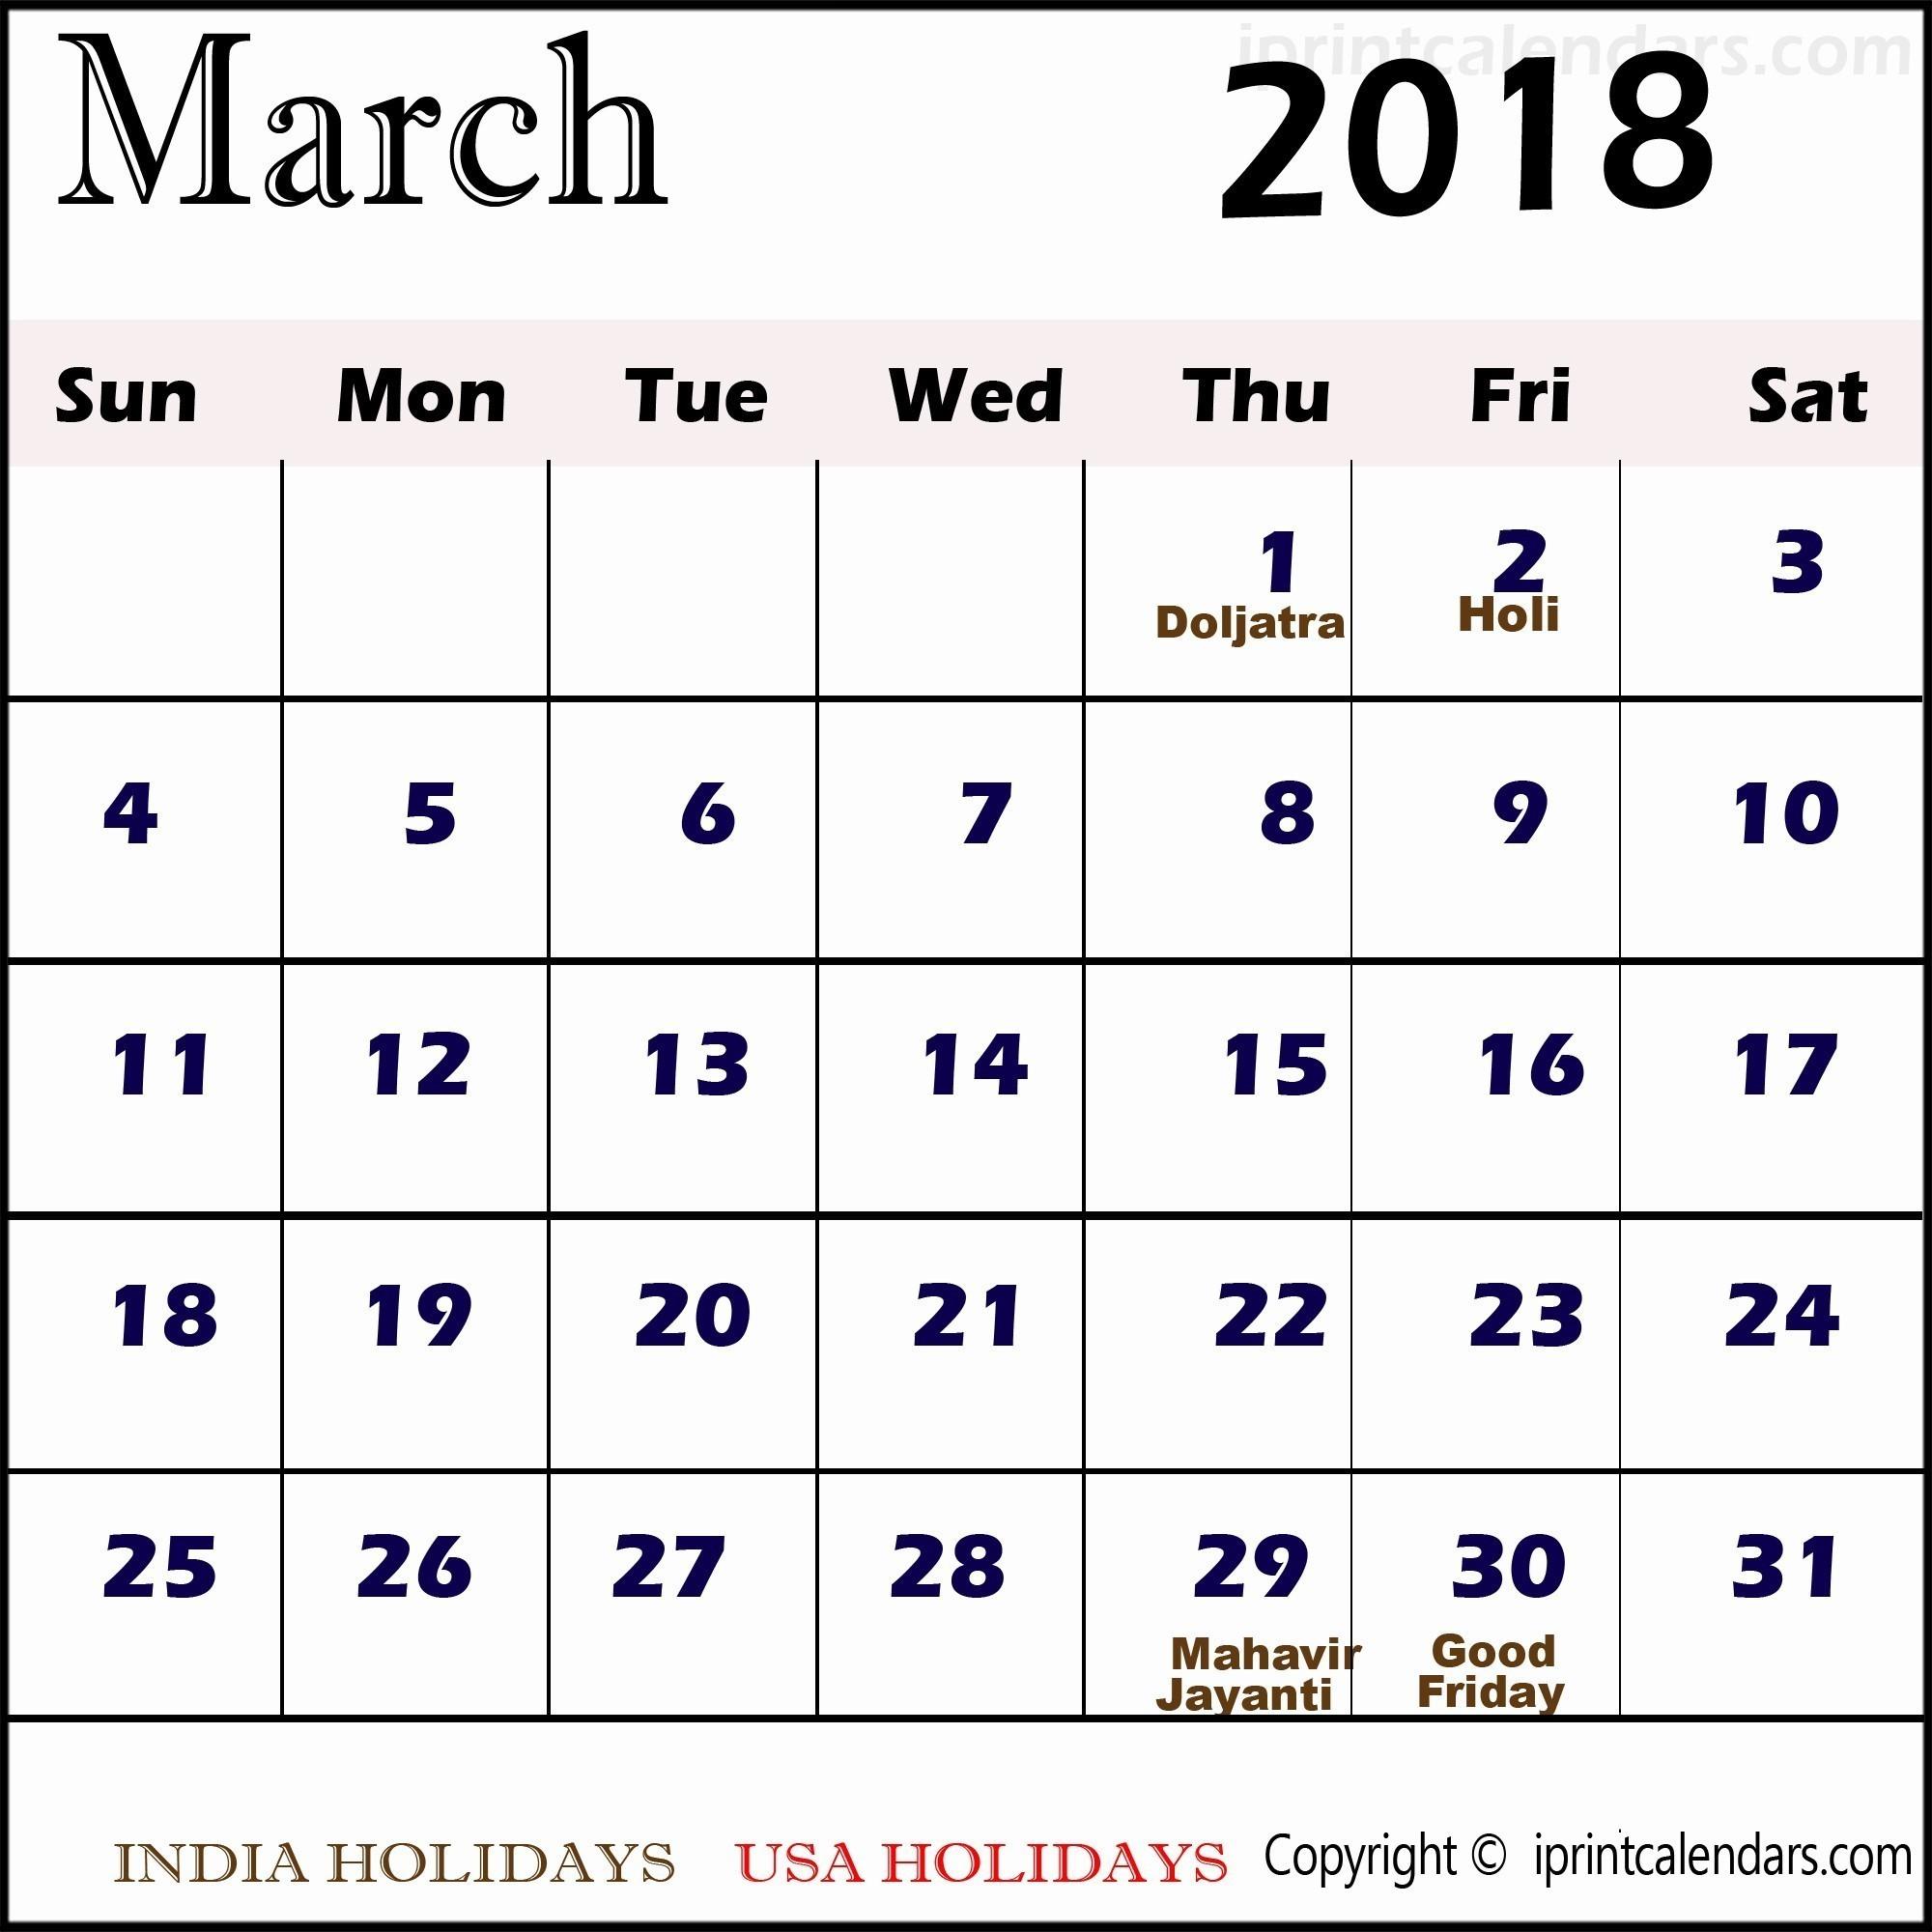 March Calendar 2019 Más Recientes Knowledge Regarding Printable Calendar for 2019 with Holidays Of March Calendar 2019 Actual Gujarati Calendar 2019 Printable Printed for No Cost – Calendaro